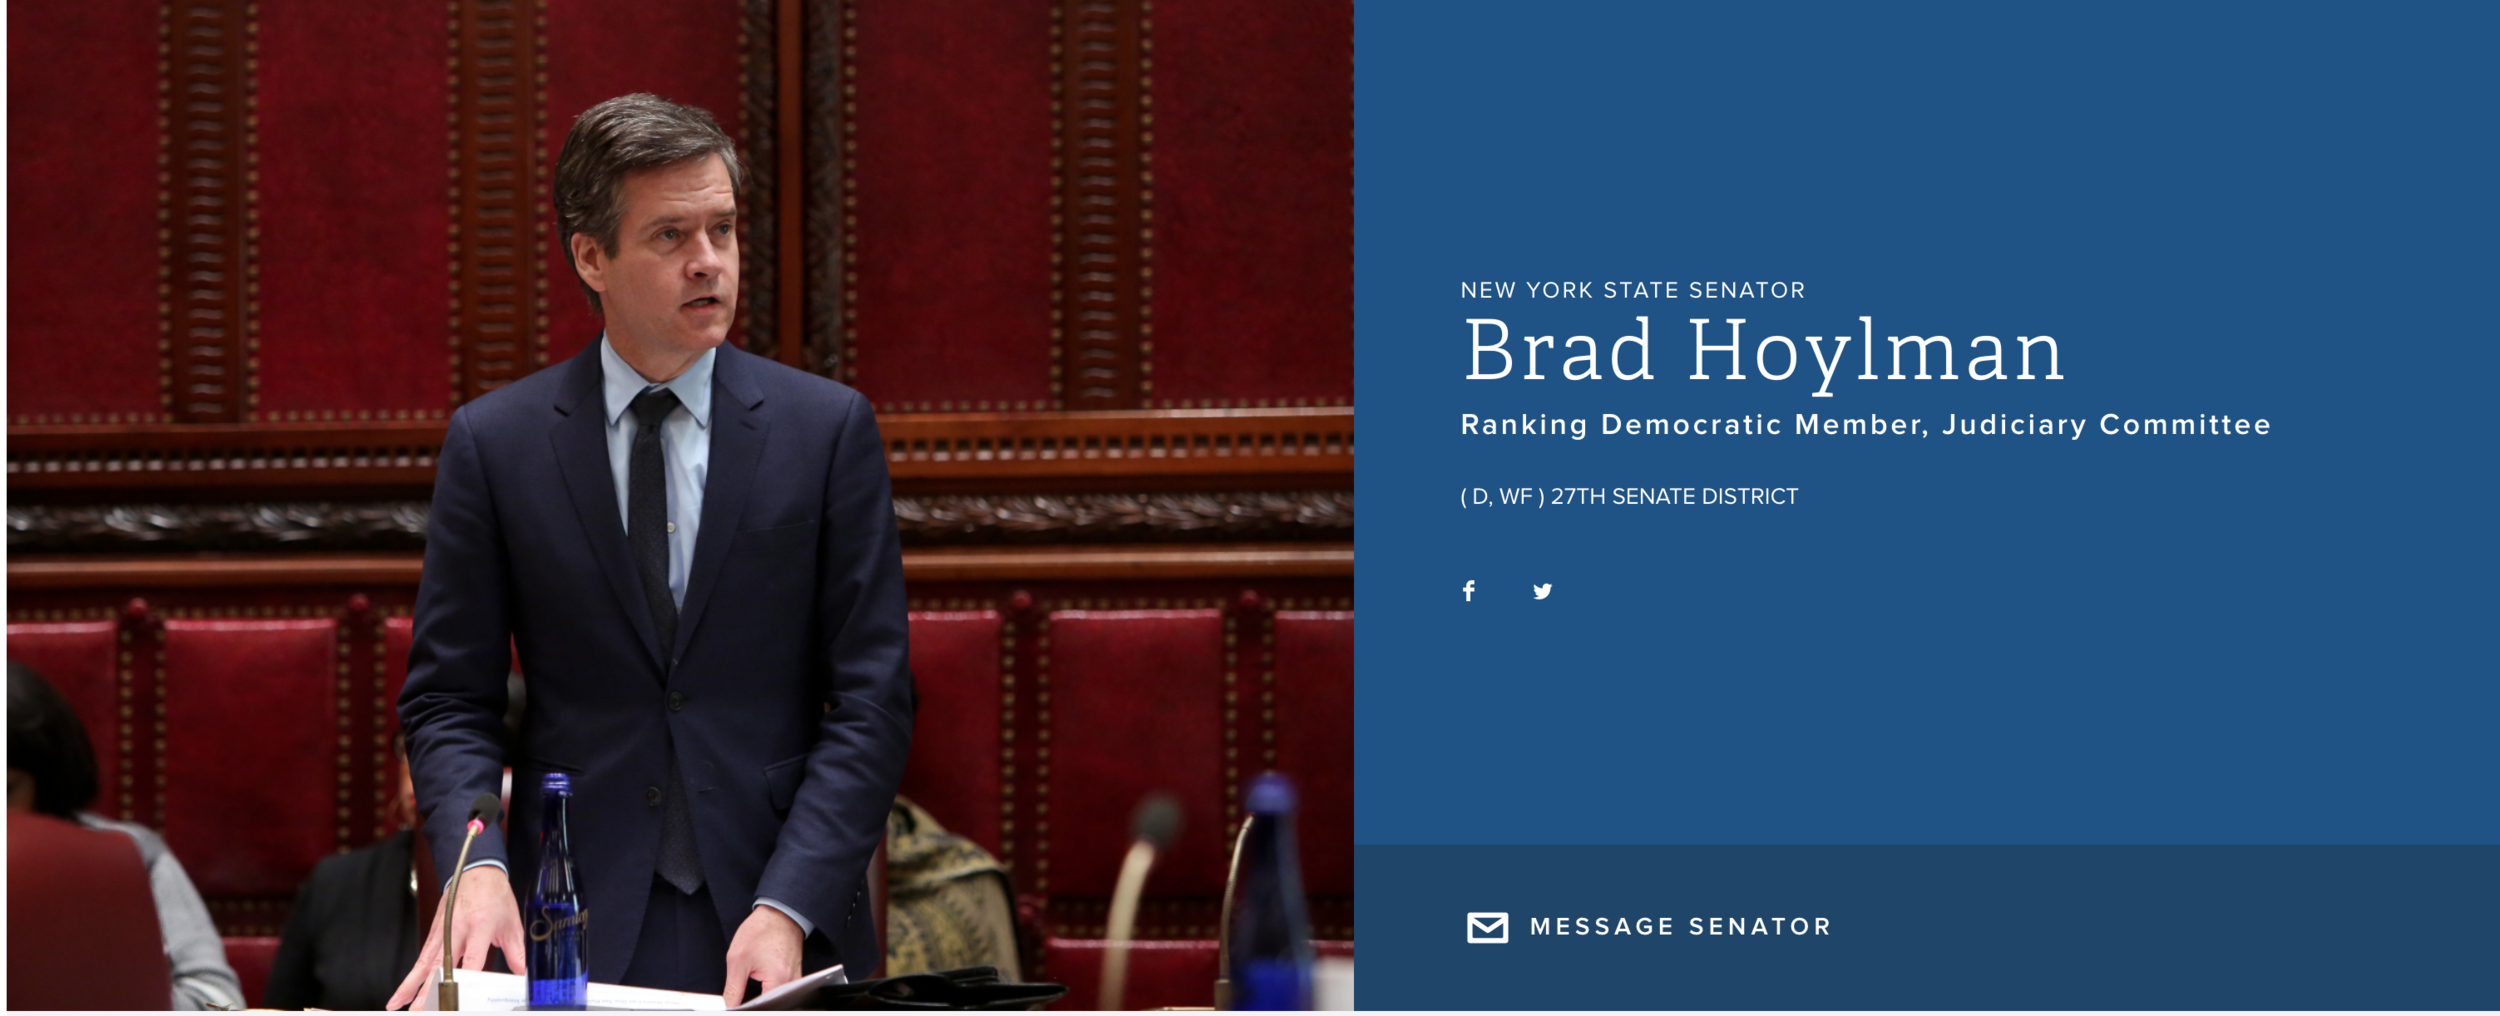 Brad Hoylman_sate senate.png